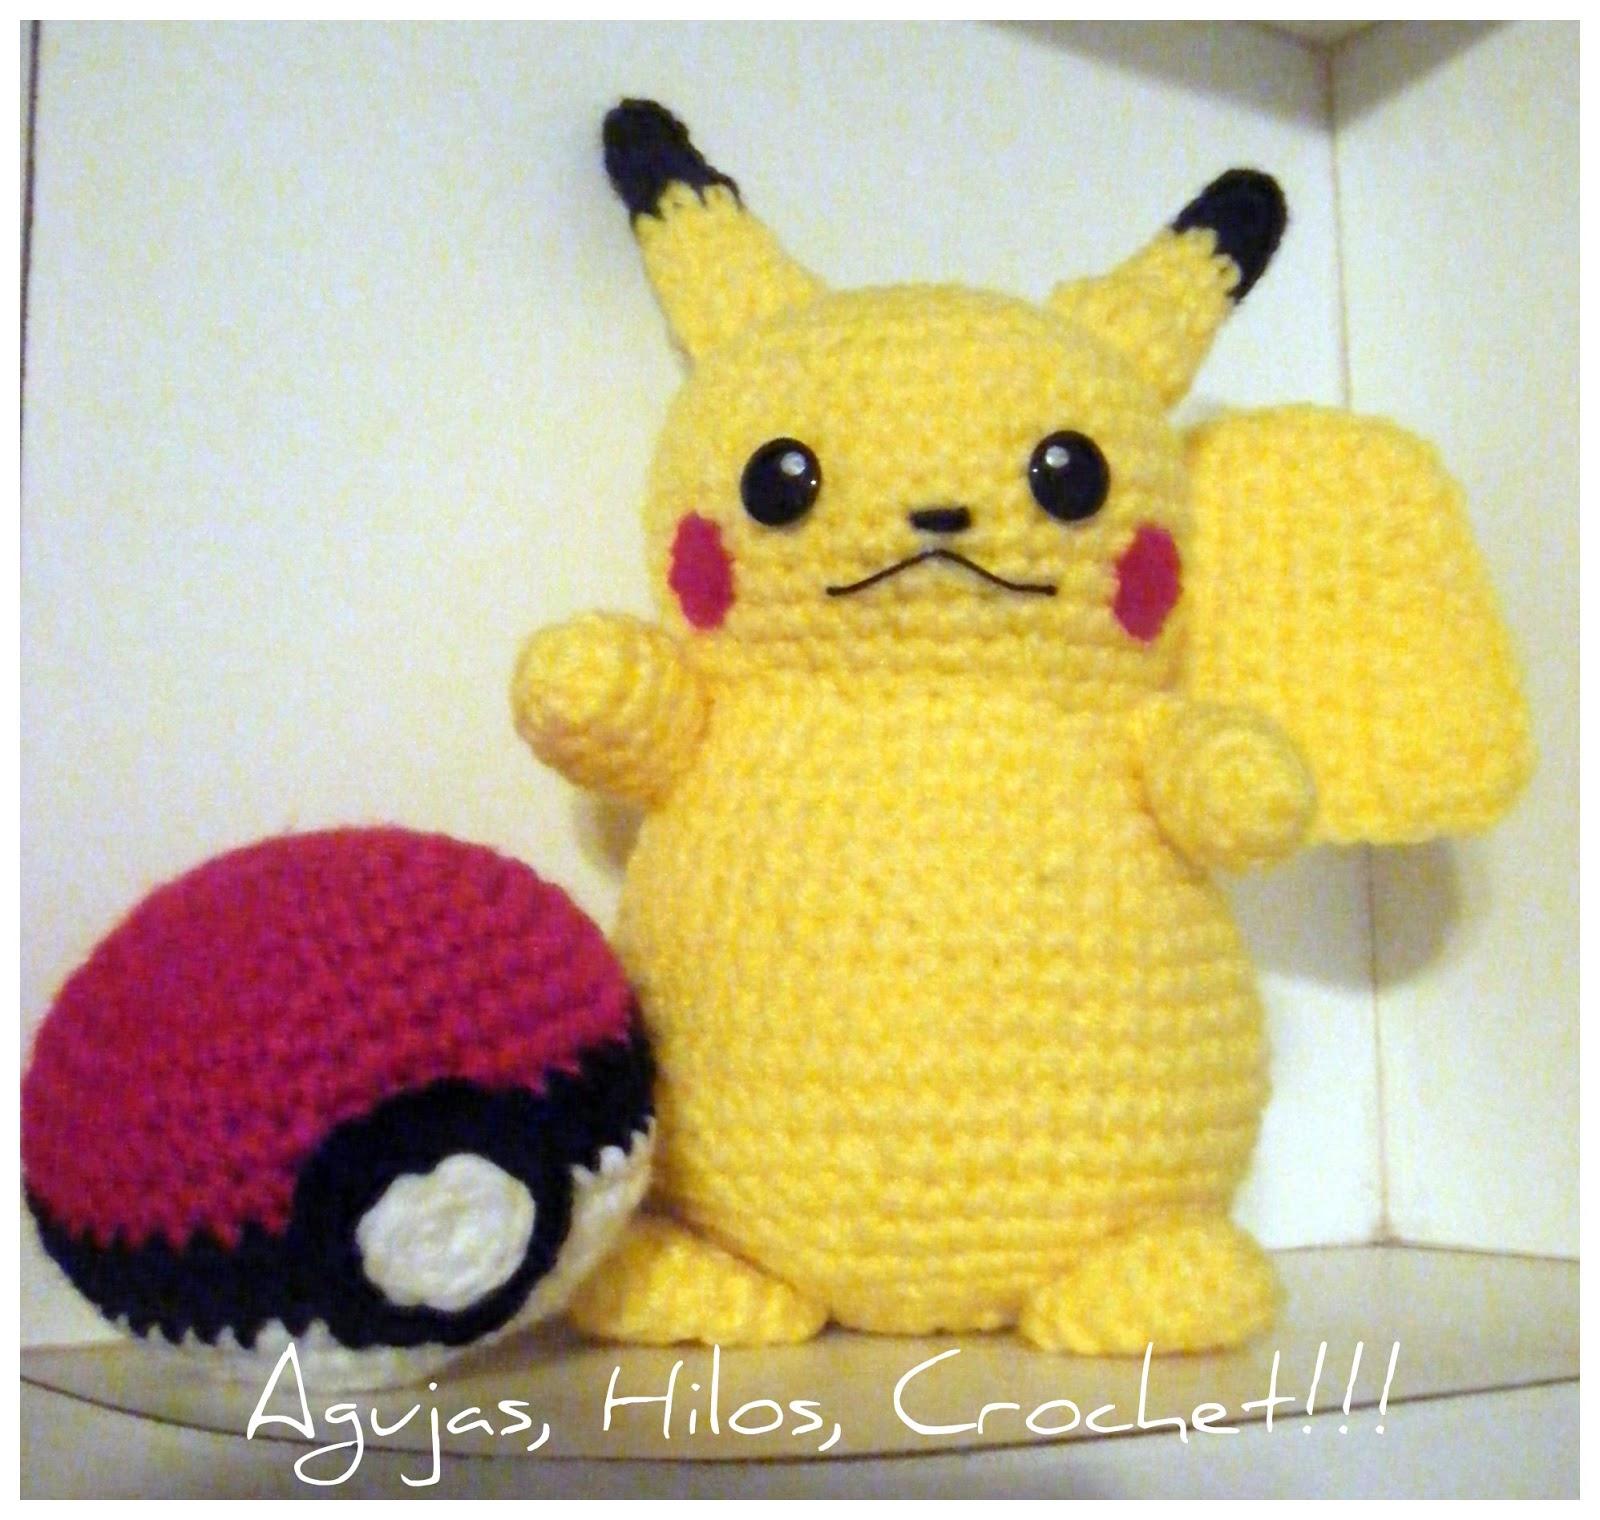 Pikachu - Agujas, Hilos... Crochet!!!